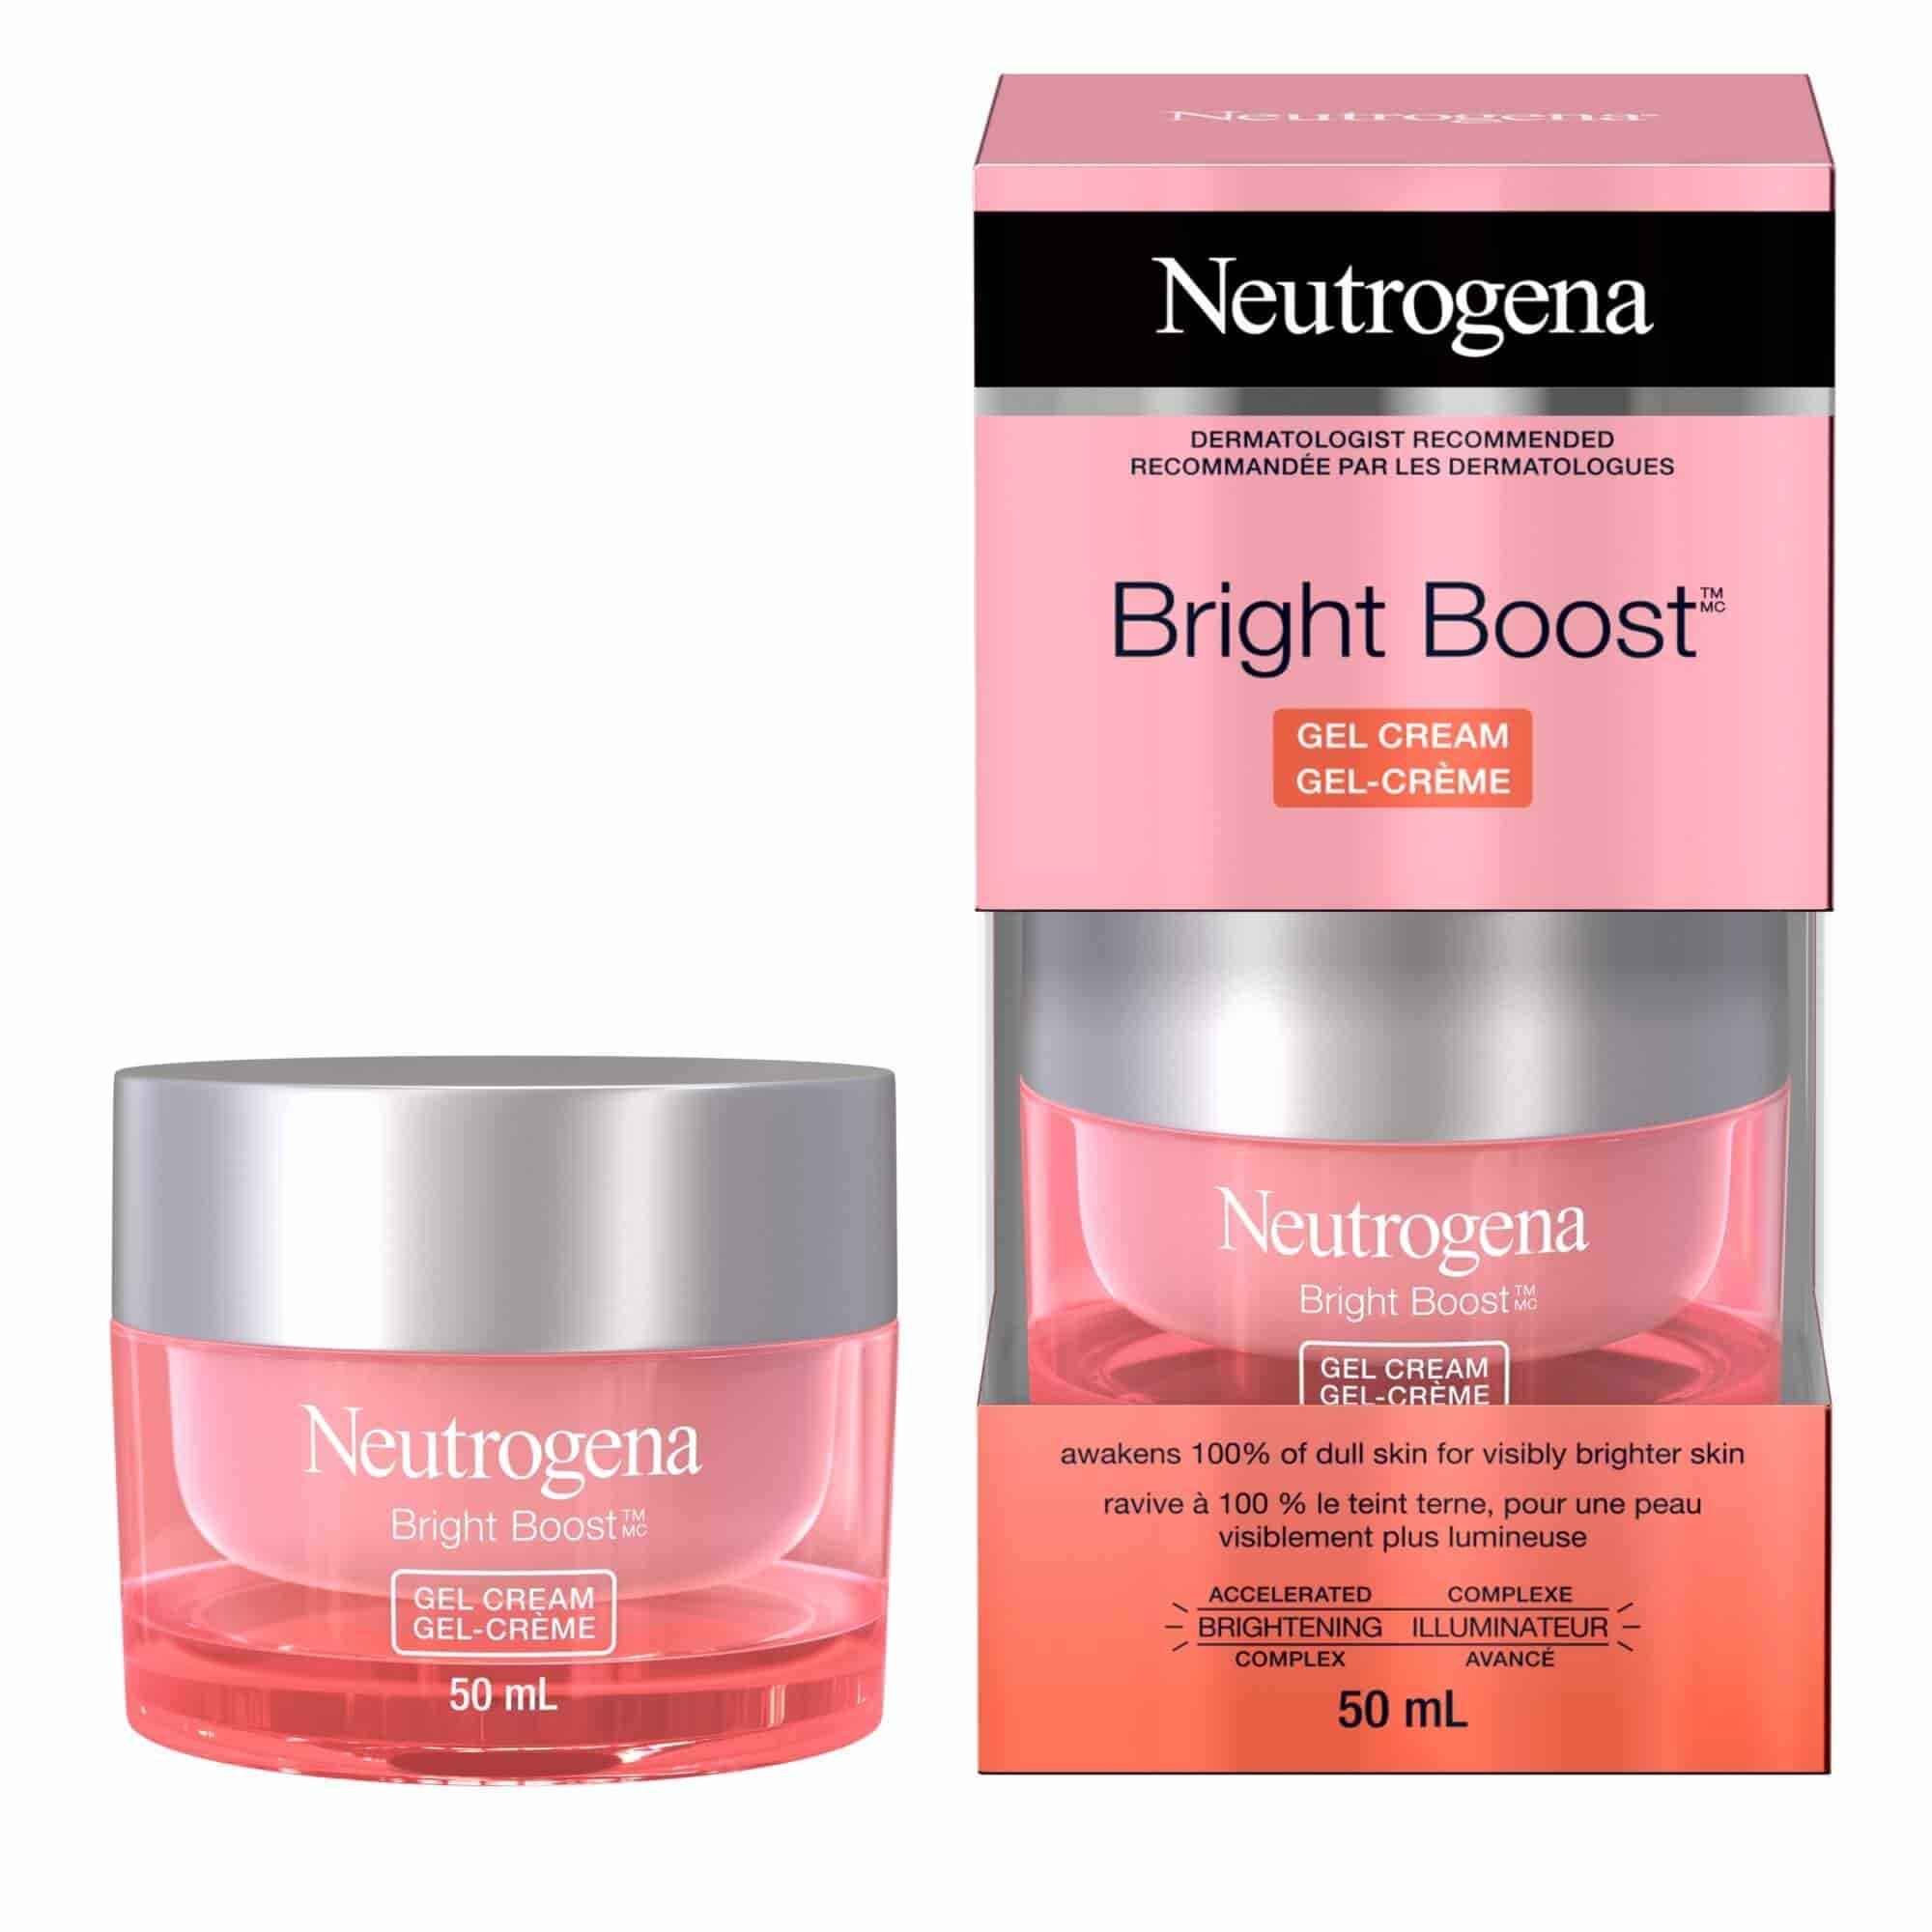 Neutrogena Bright Boost™ Gel Cream, 50 ml